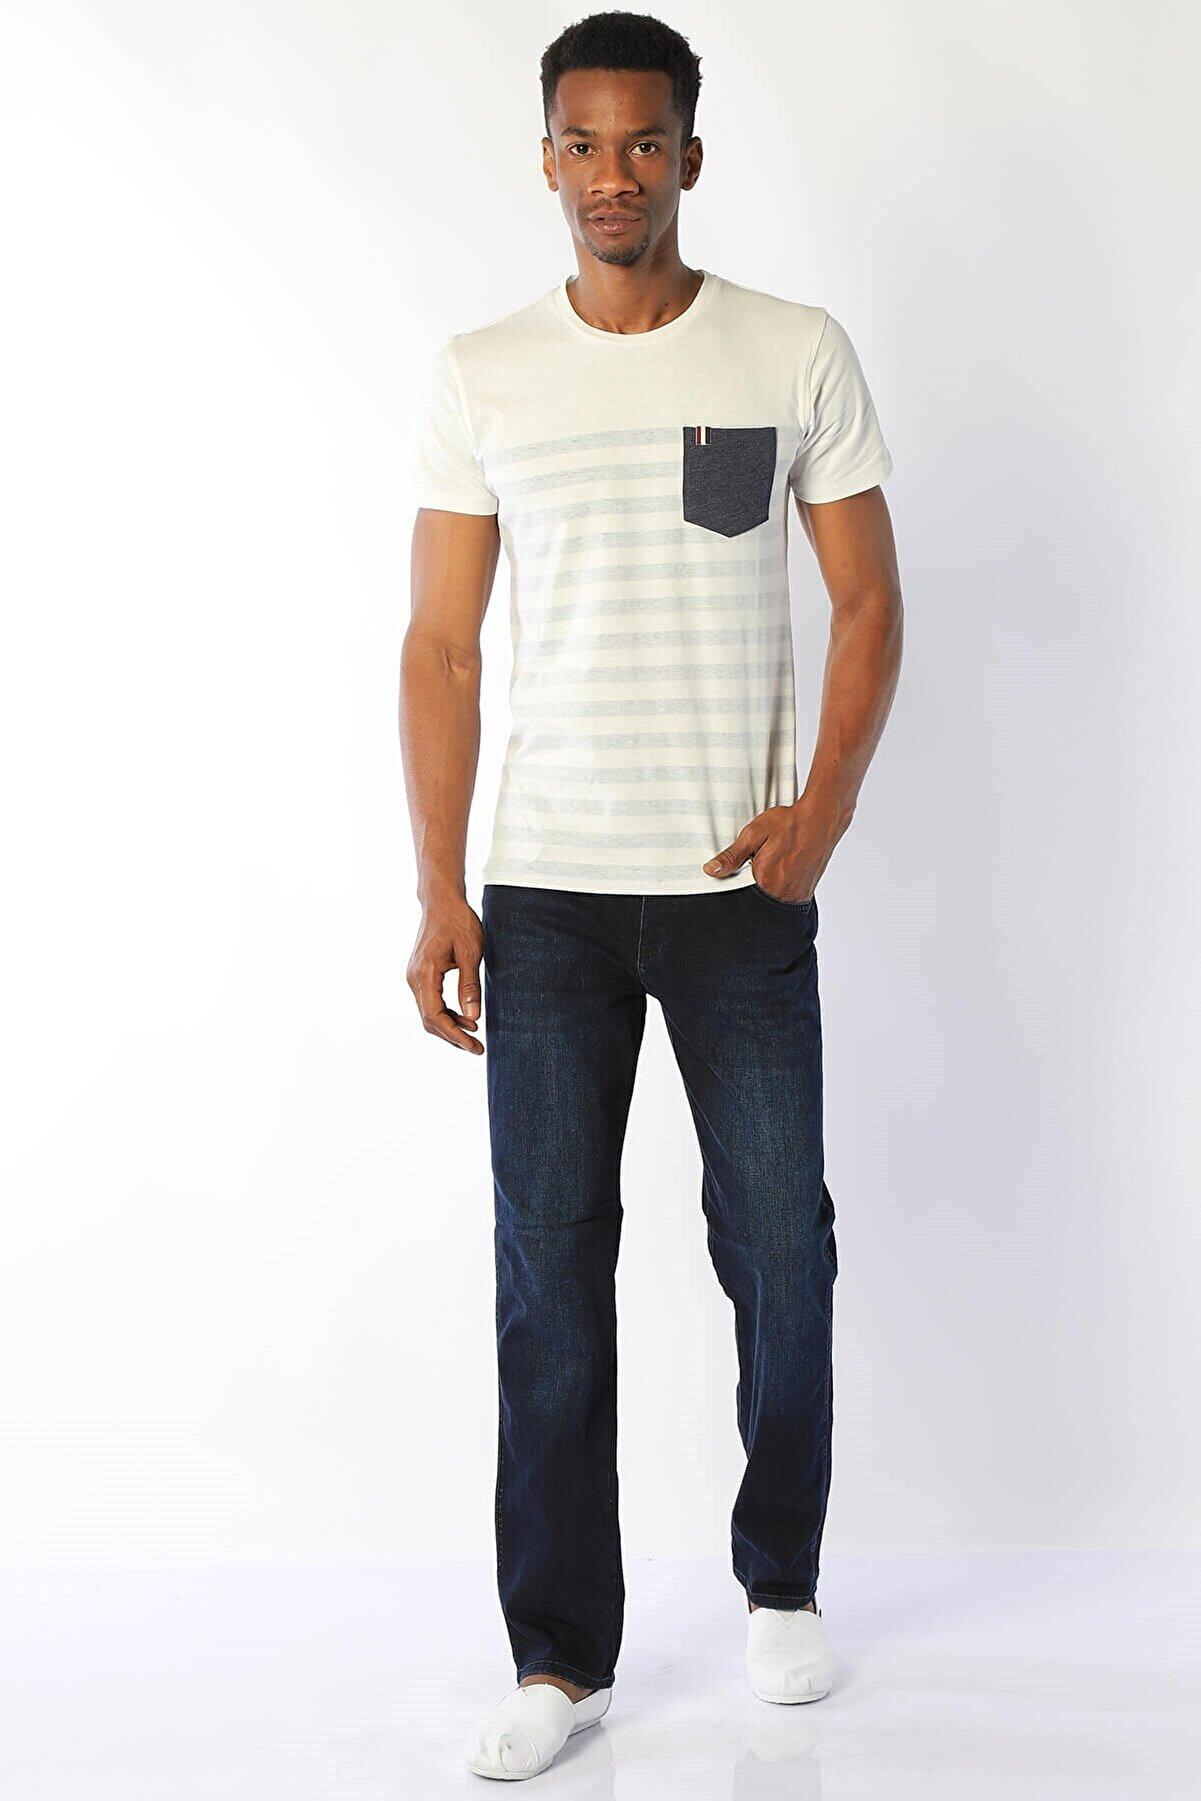 Twister Jeans Erkek Regular Fit Yüksek Bel Pantolon Vegas 132-142 Ba Lacıvert